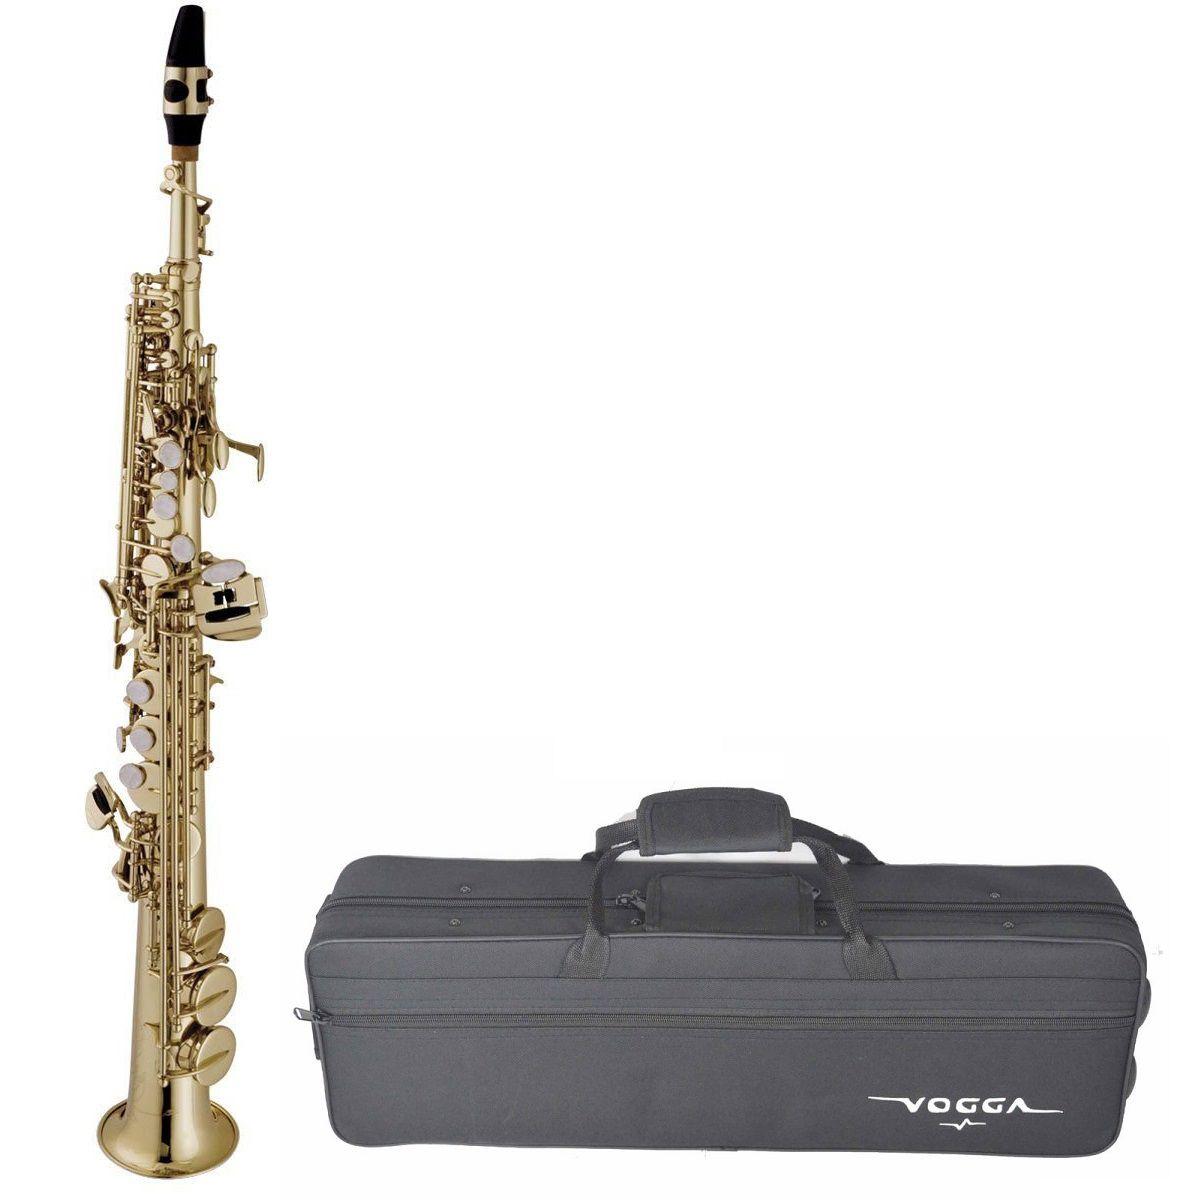 Saxofone Soprano Vogga Vssp701N